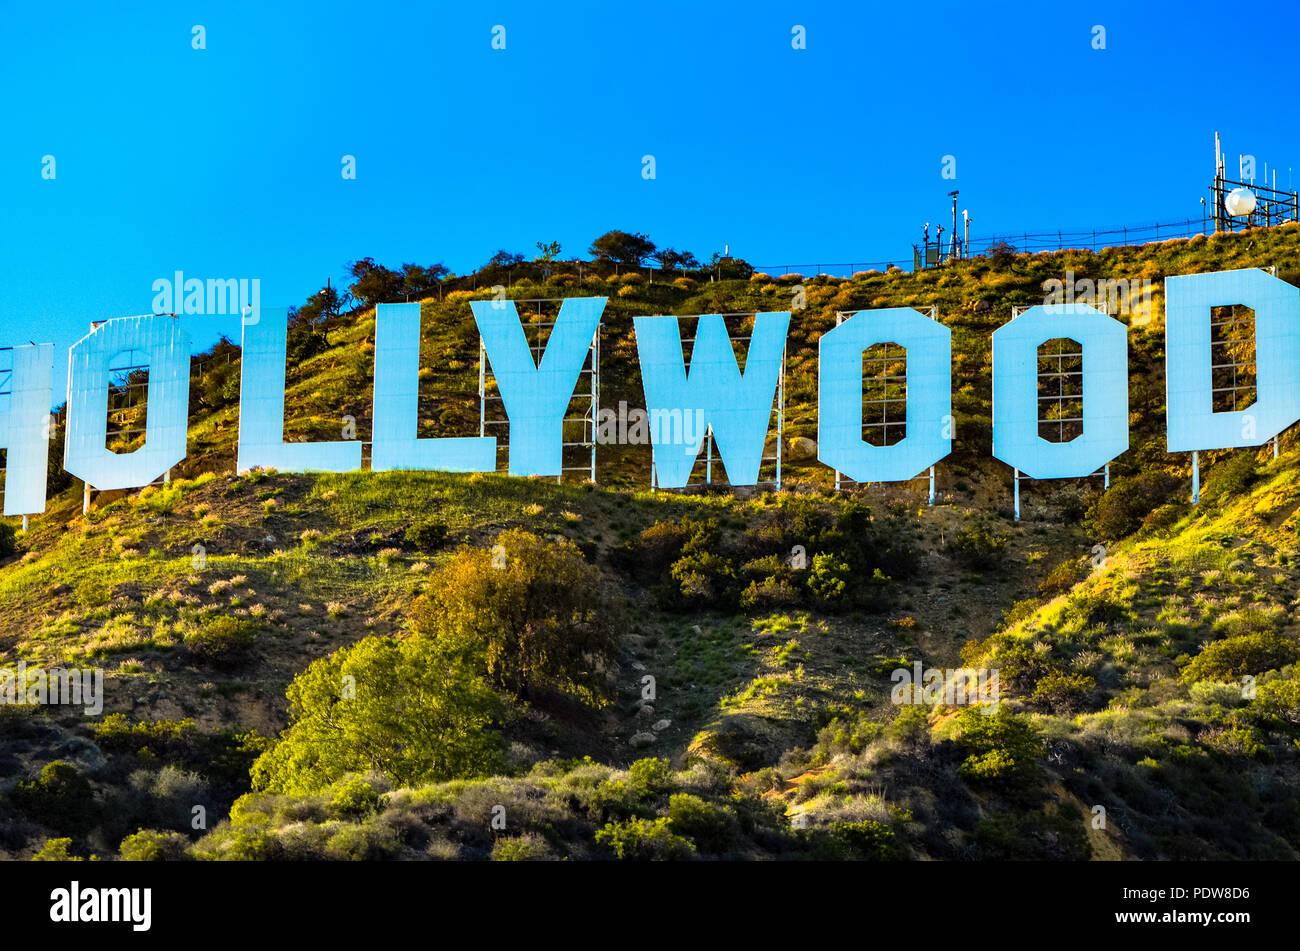 L'iconico Hollywood Sign in colline di Los Angeles in California Foto Stock